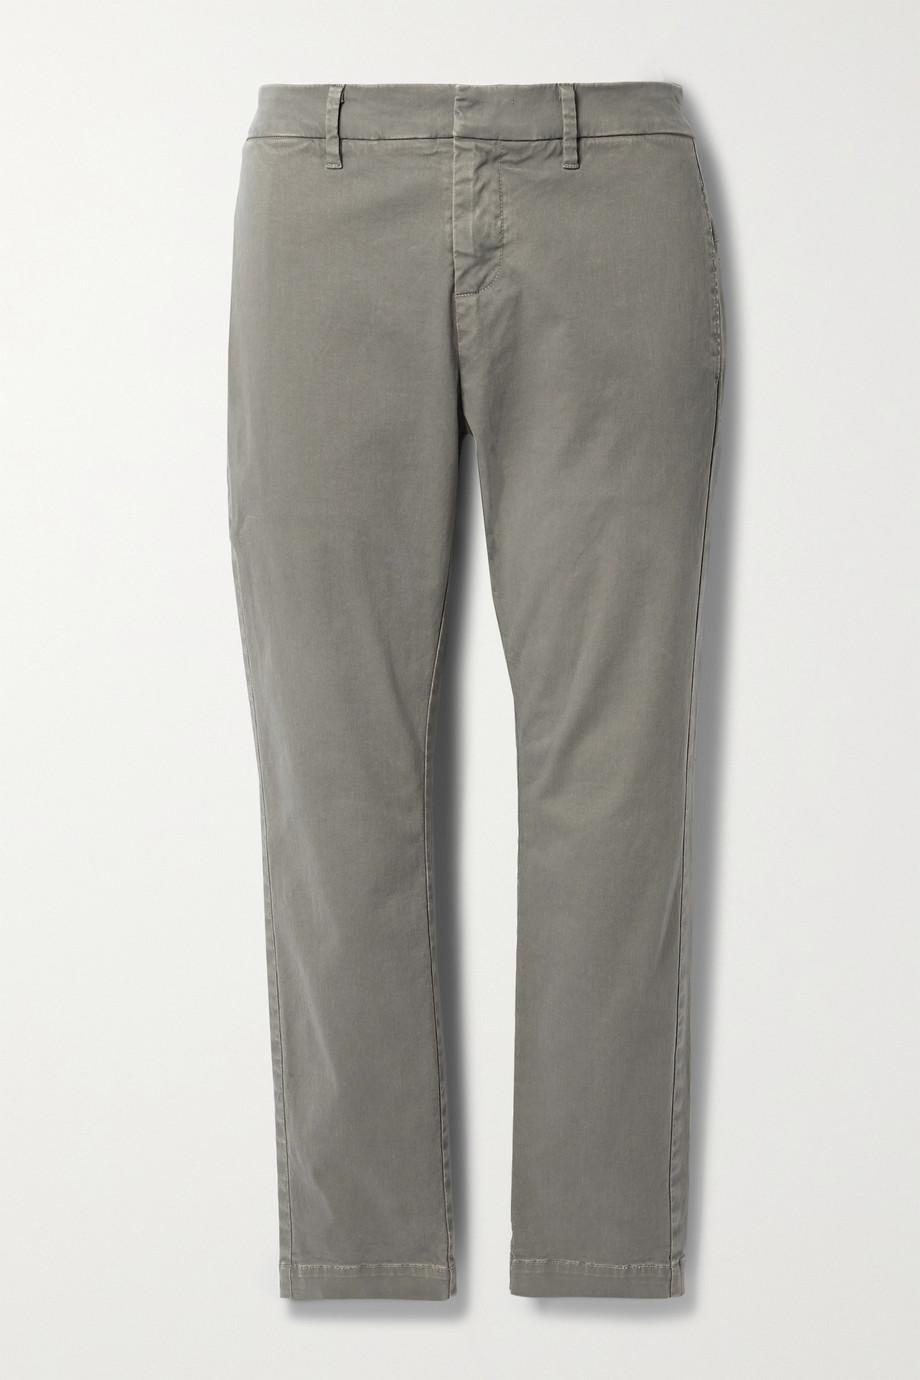 Nili Lotan Tel Aviv cropped stretch-cotton twill tapered pants